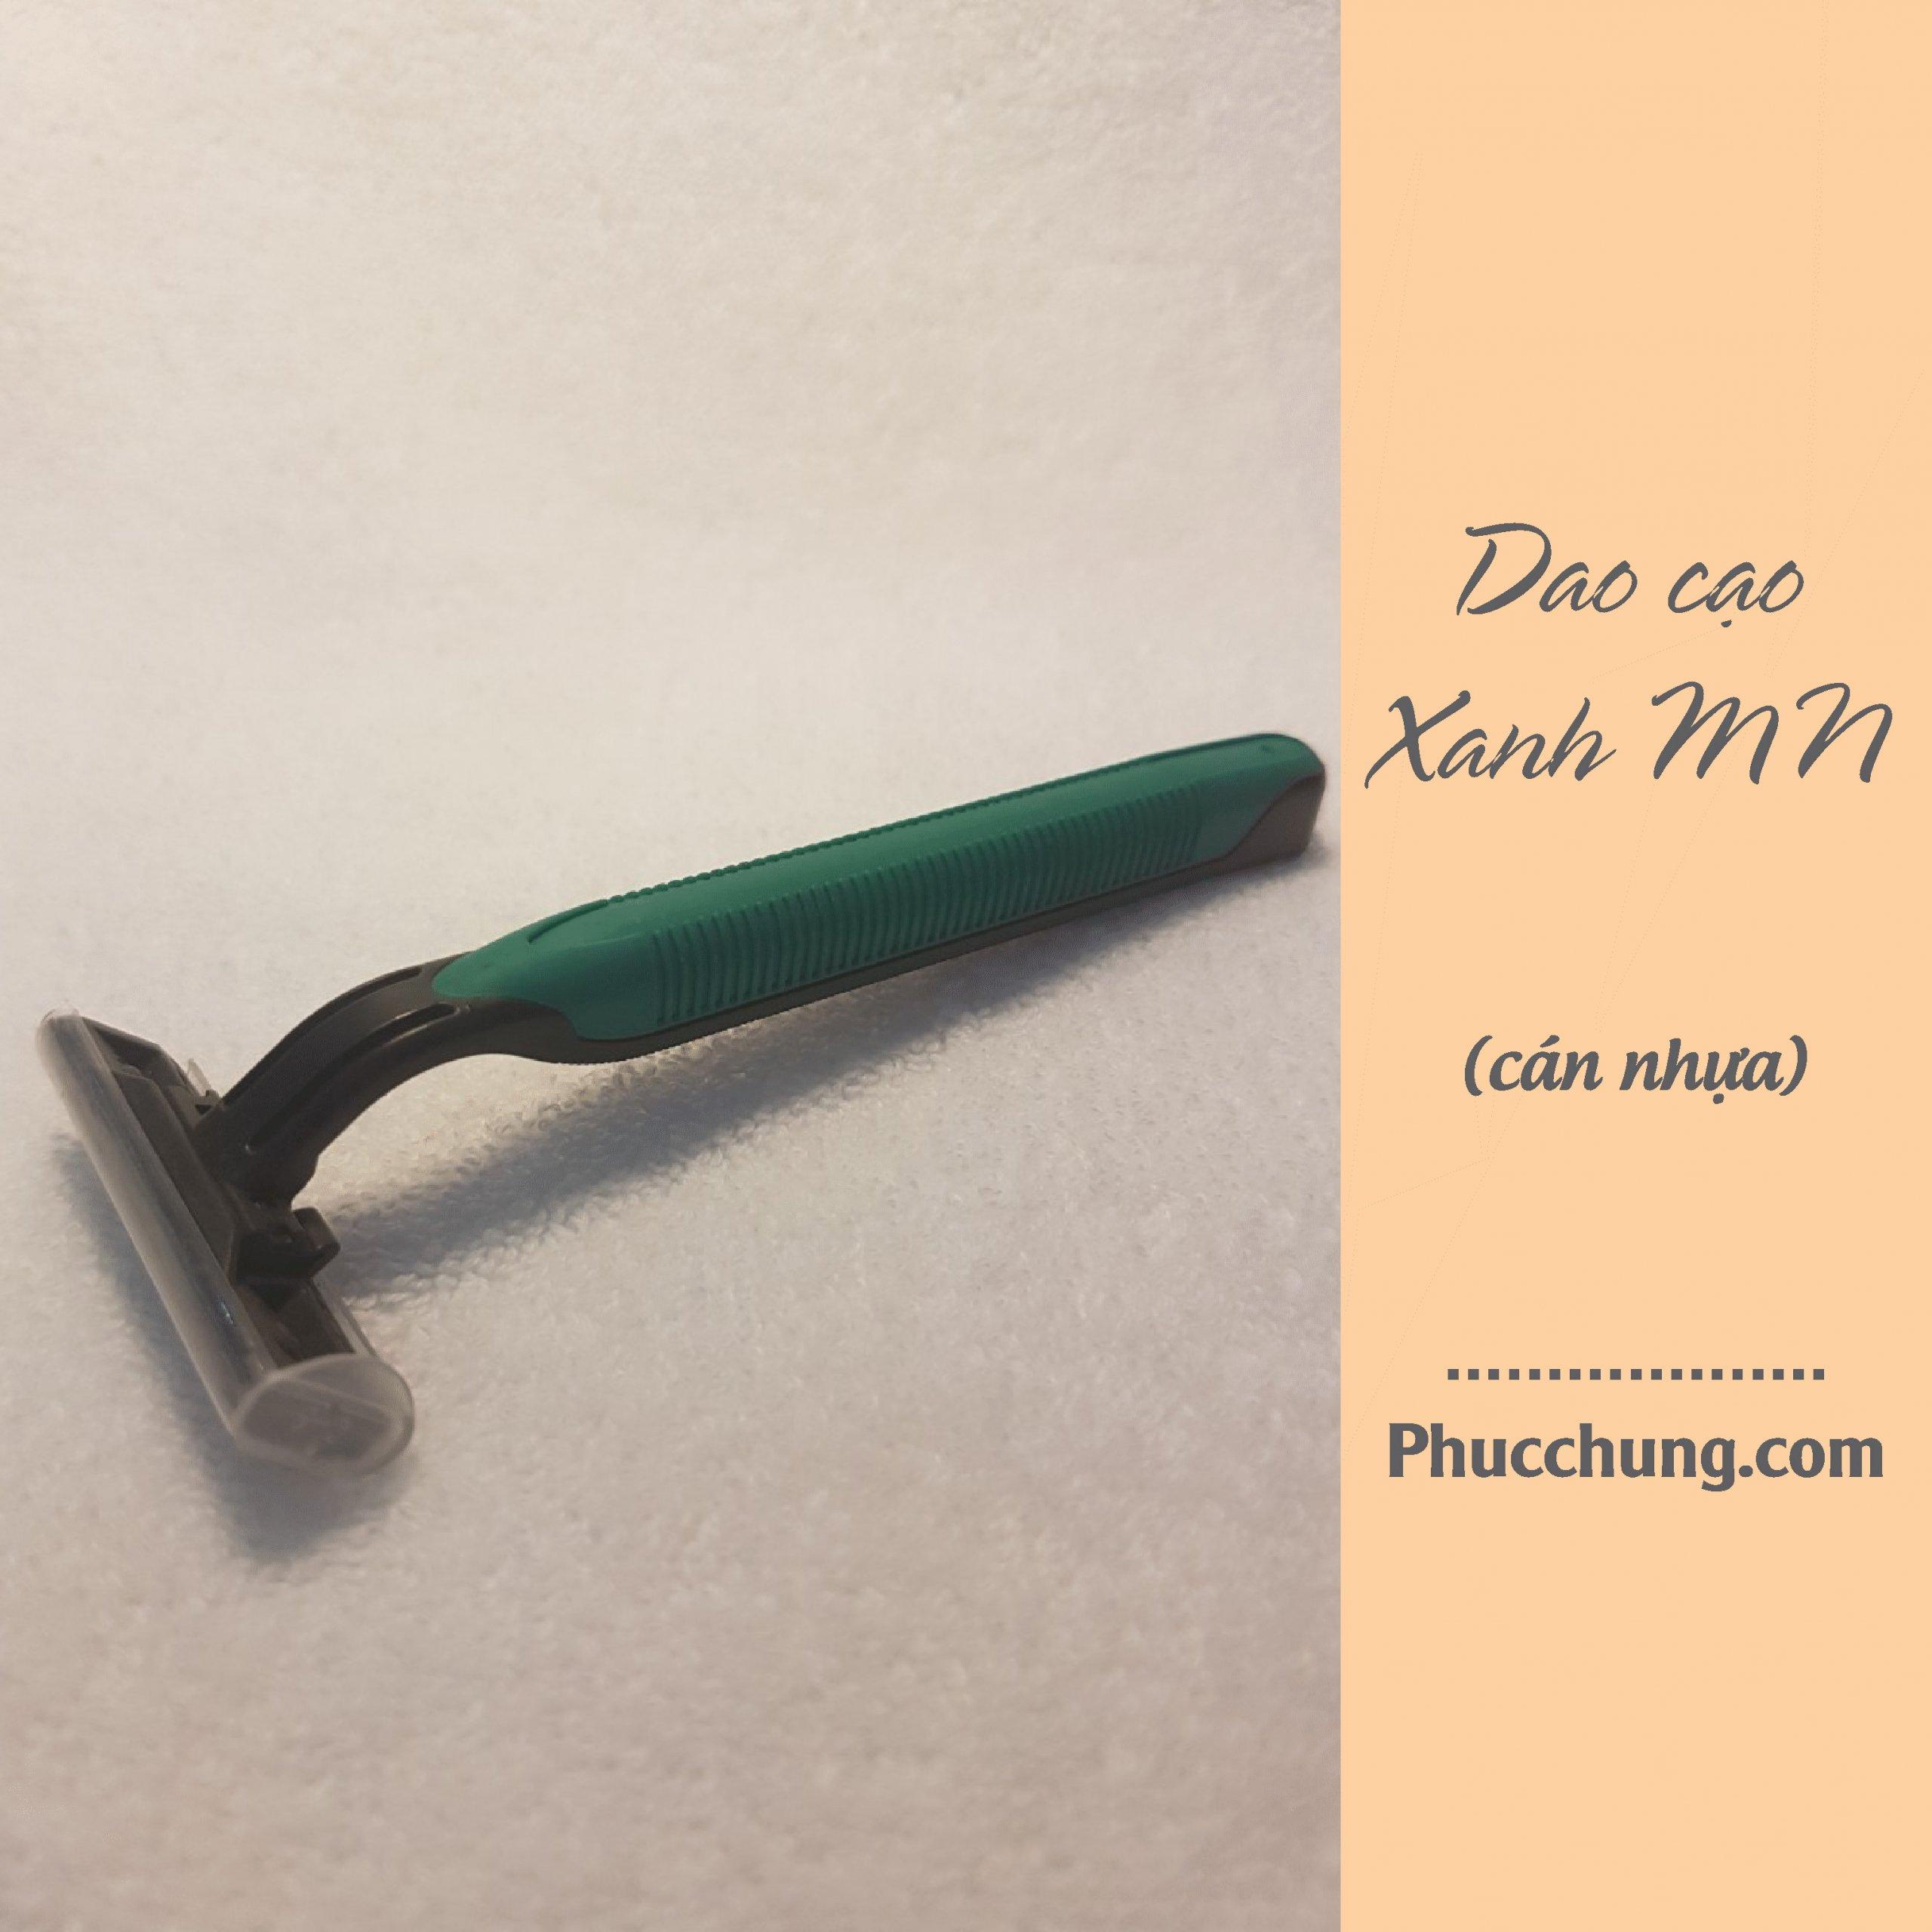 Dao cạo râu cán nhựa 09